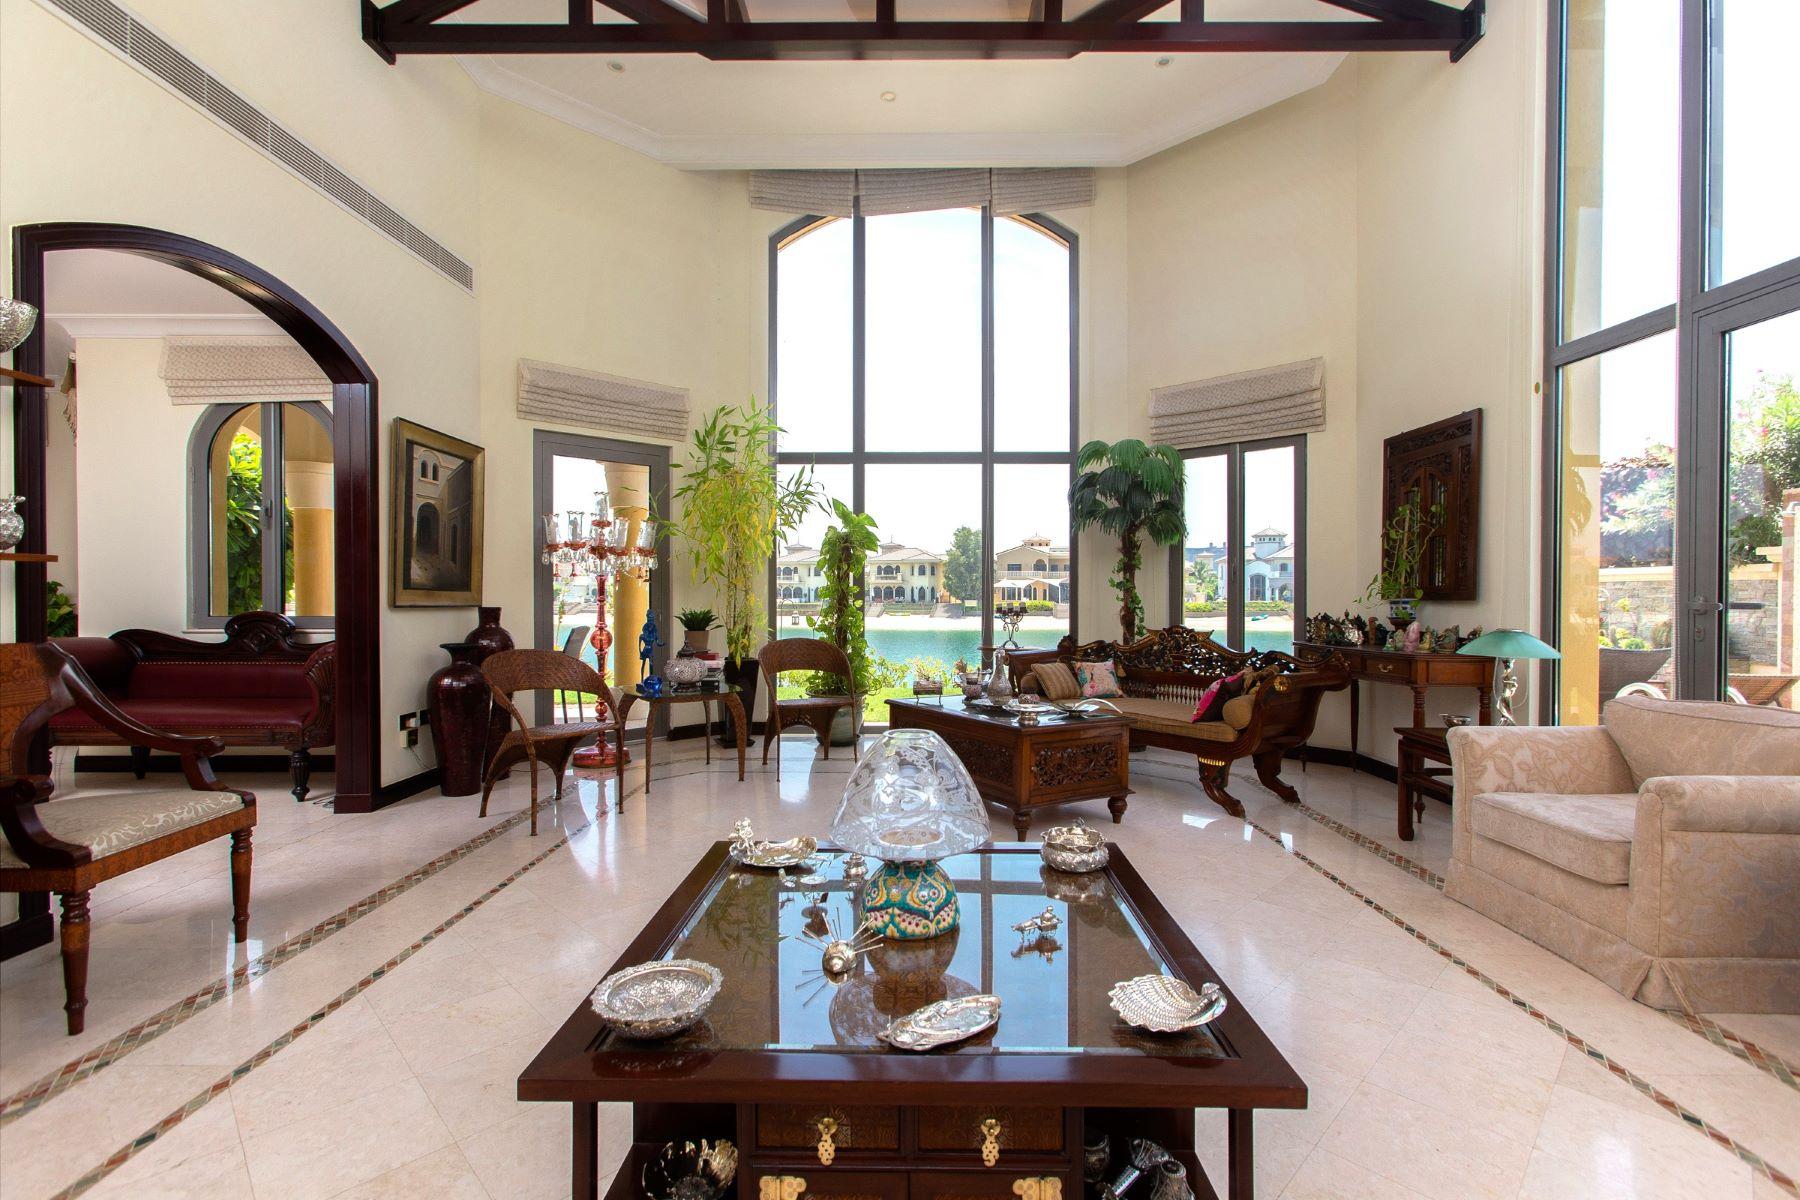 Property for Sale at Bigger Plot Vastu Compliant Garden Villa Dubai, Dubai United Arab Emirates